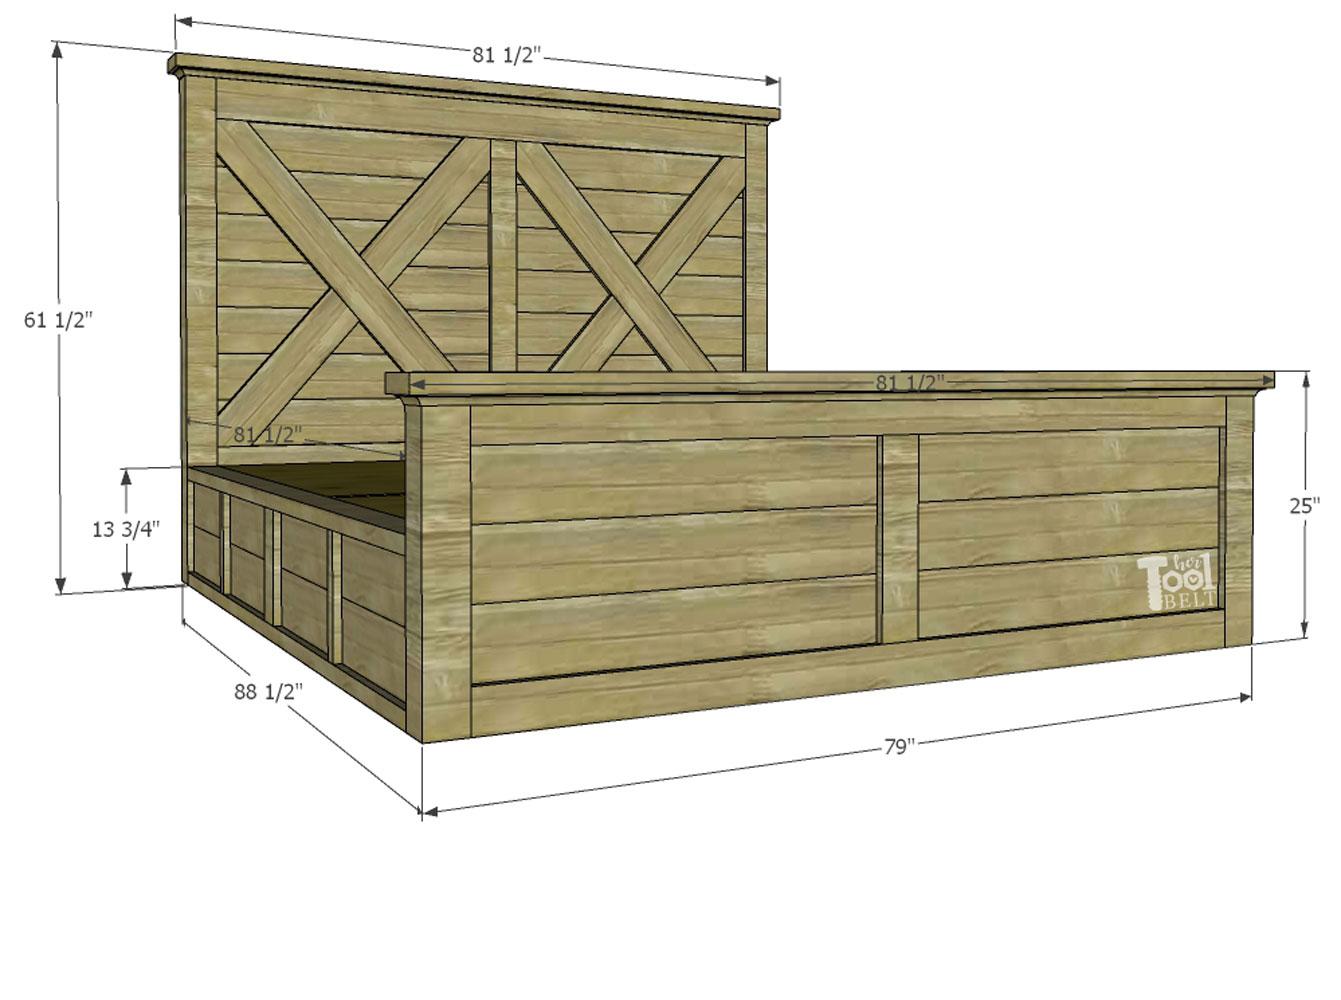 King X Barn Door Farmhouse Bed Plans - Her Tool Belt